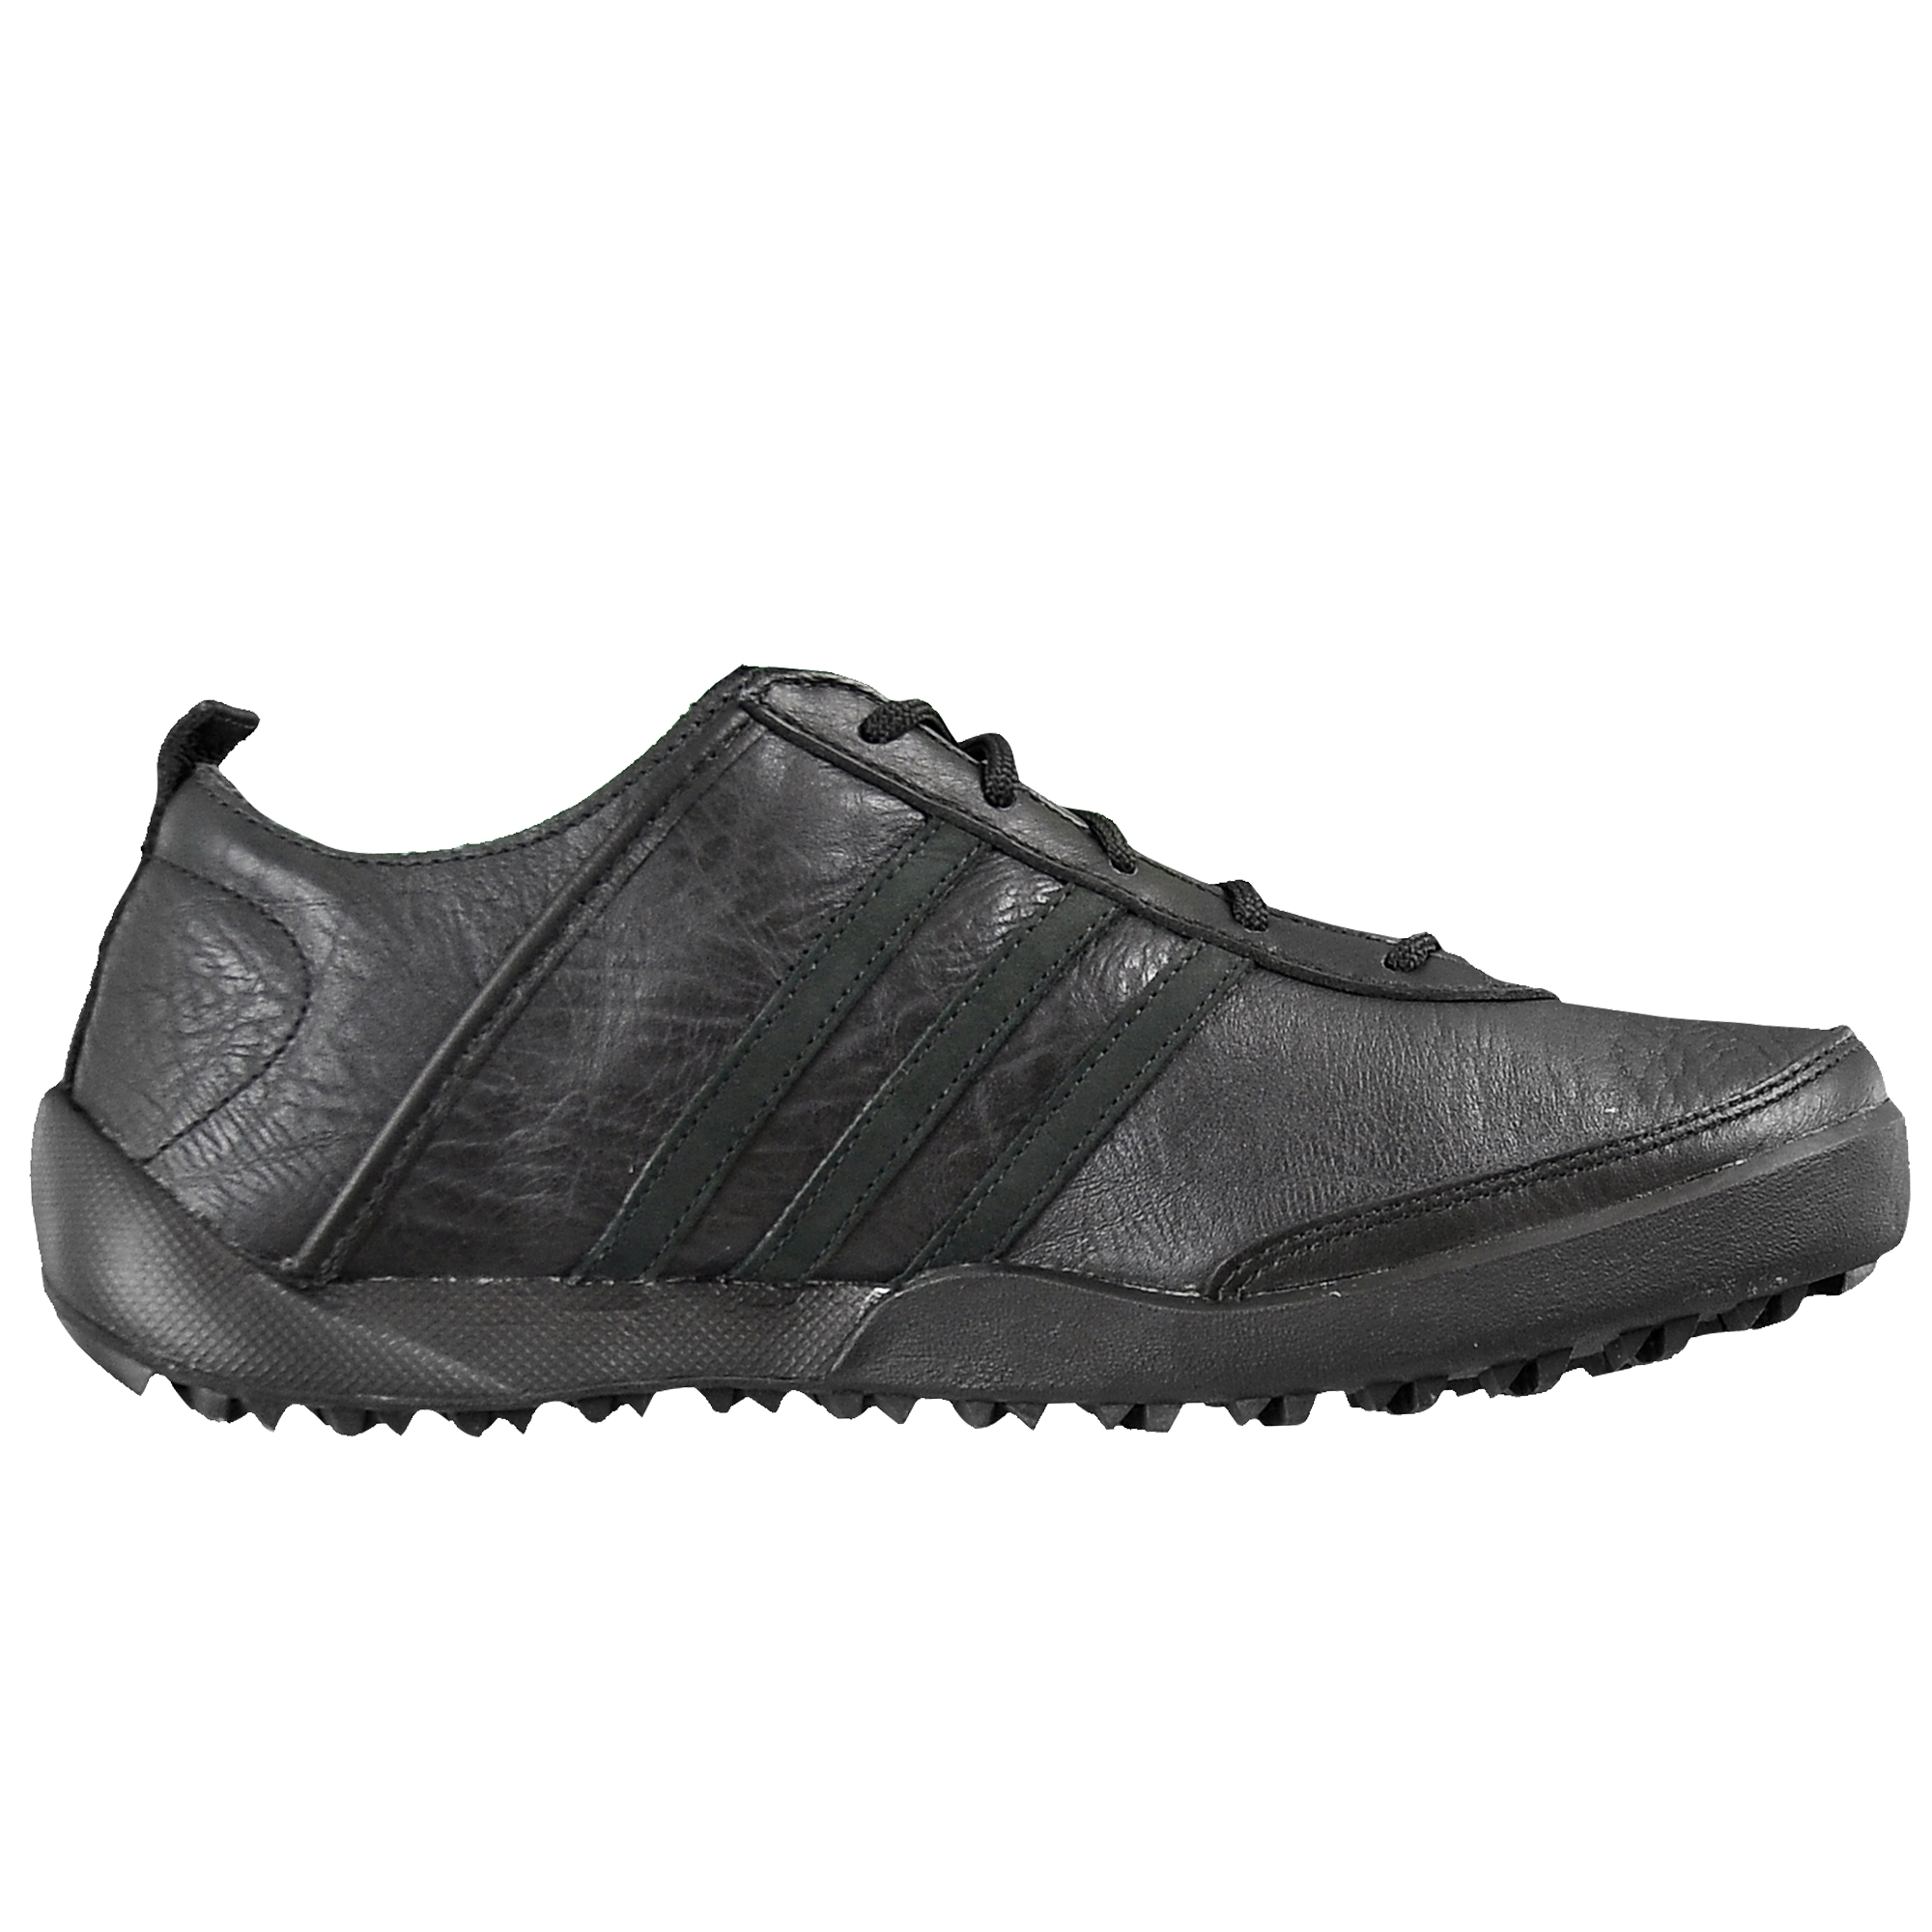 adidas anzit fg spor ayakkabı